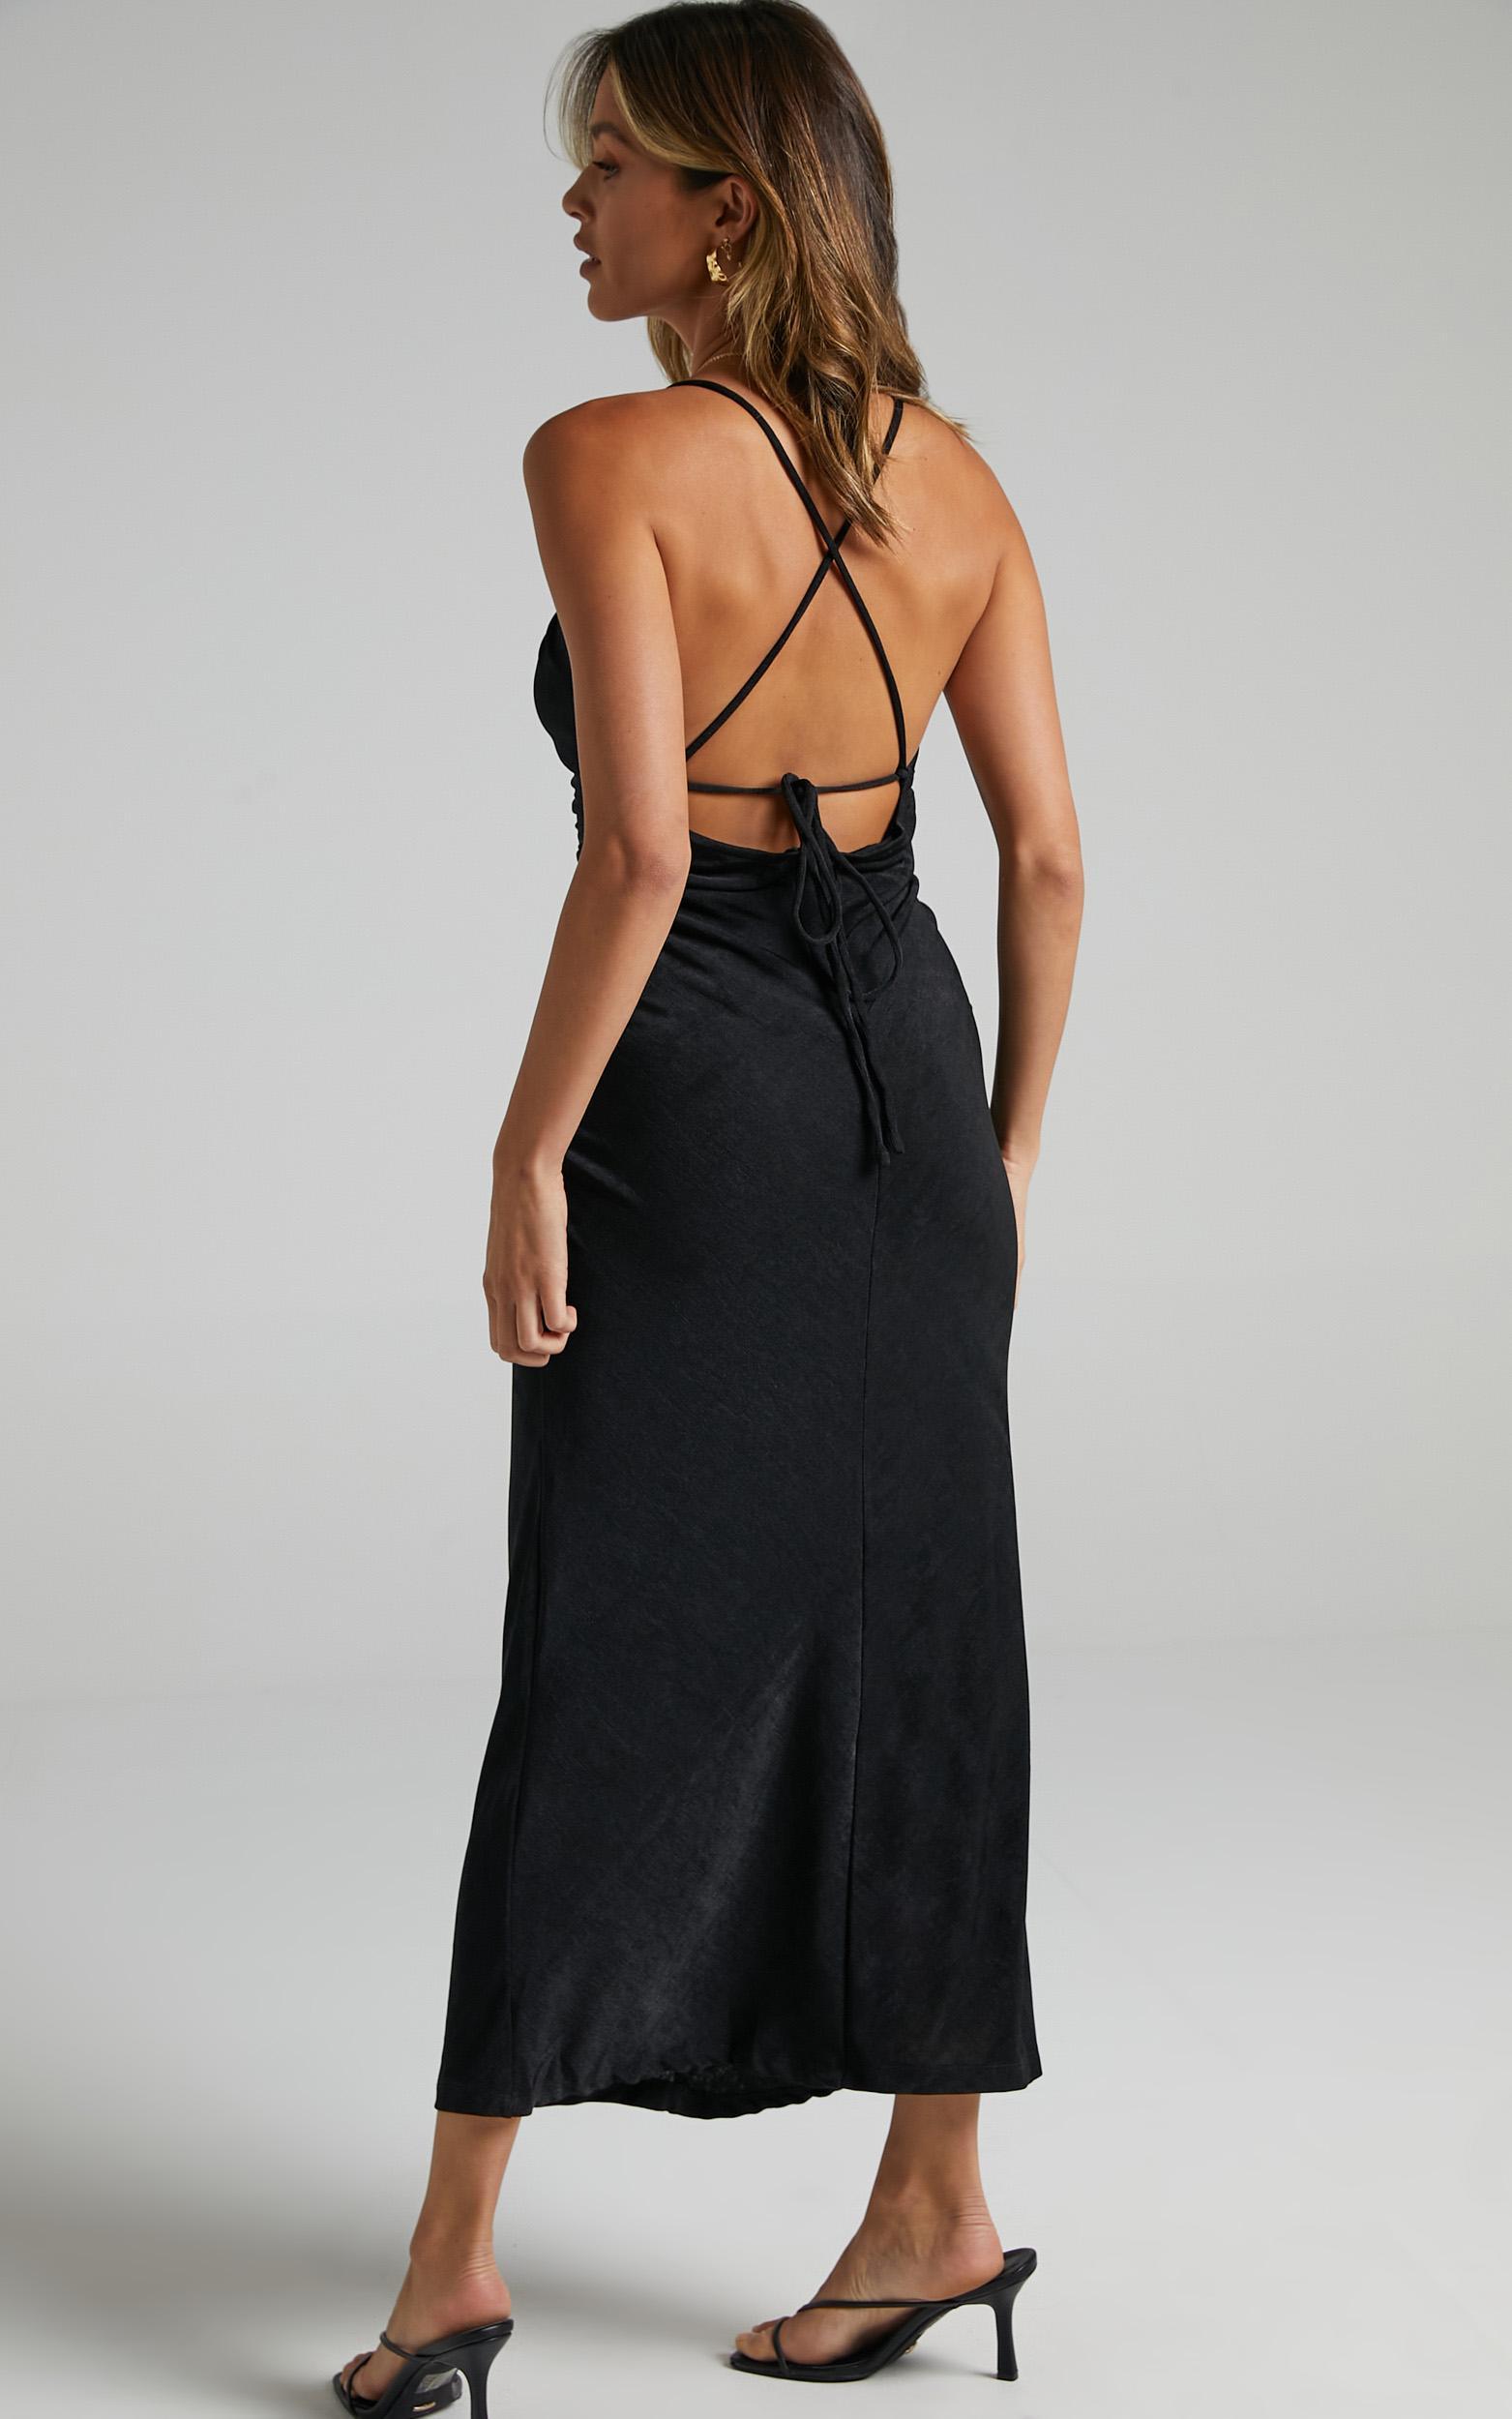 Yassie Dress in Black - 06, BLK1, hi-res image number null